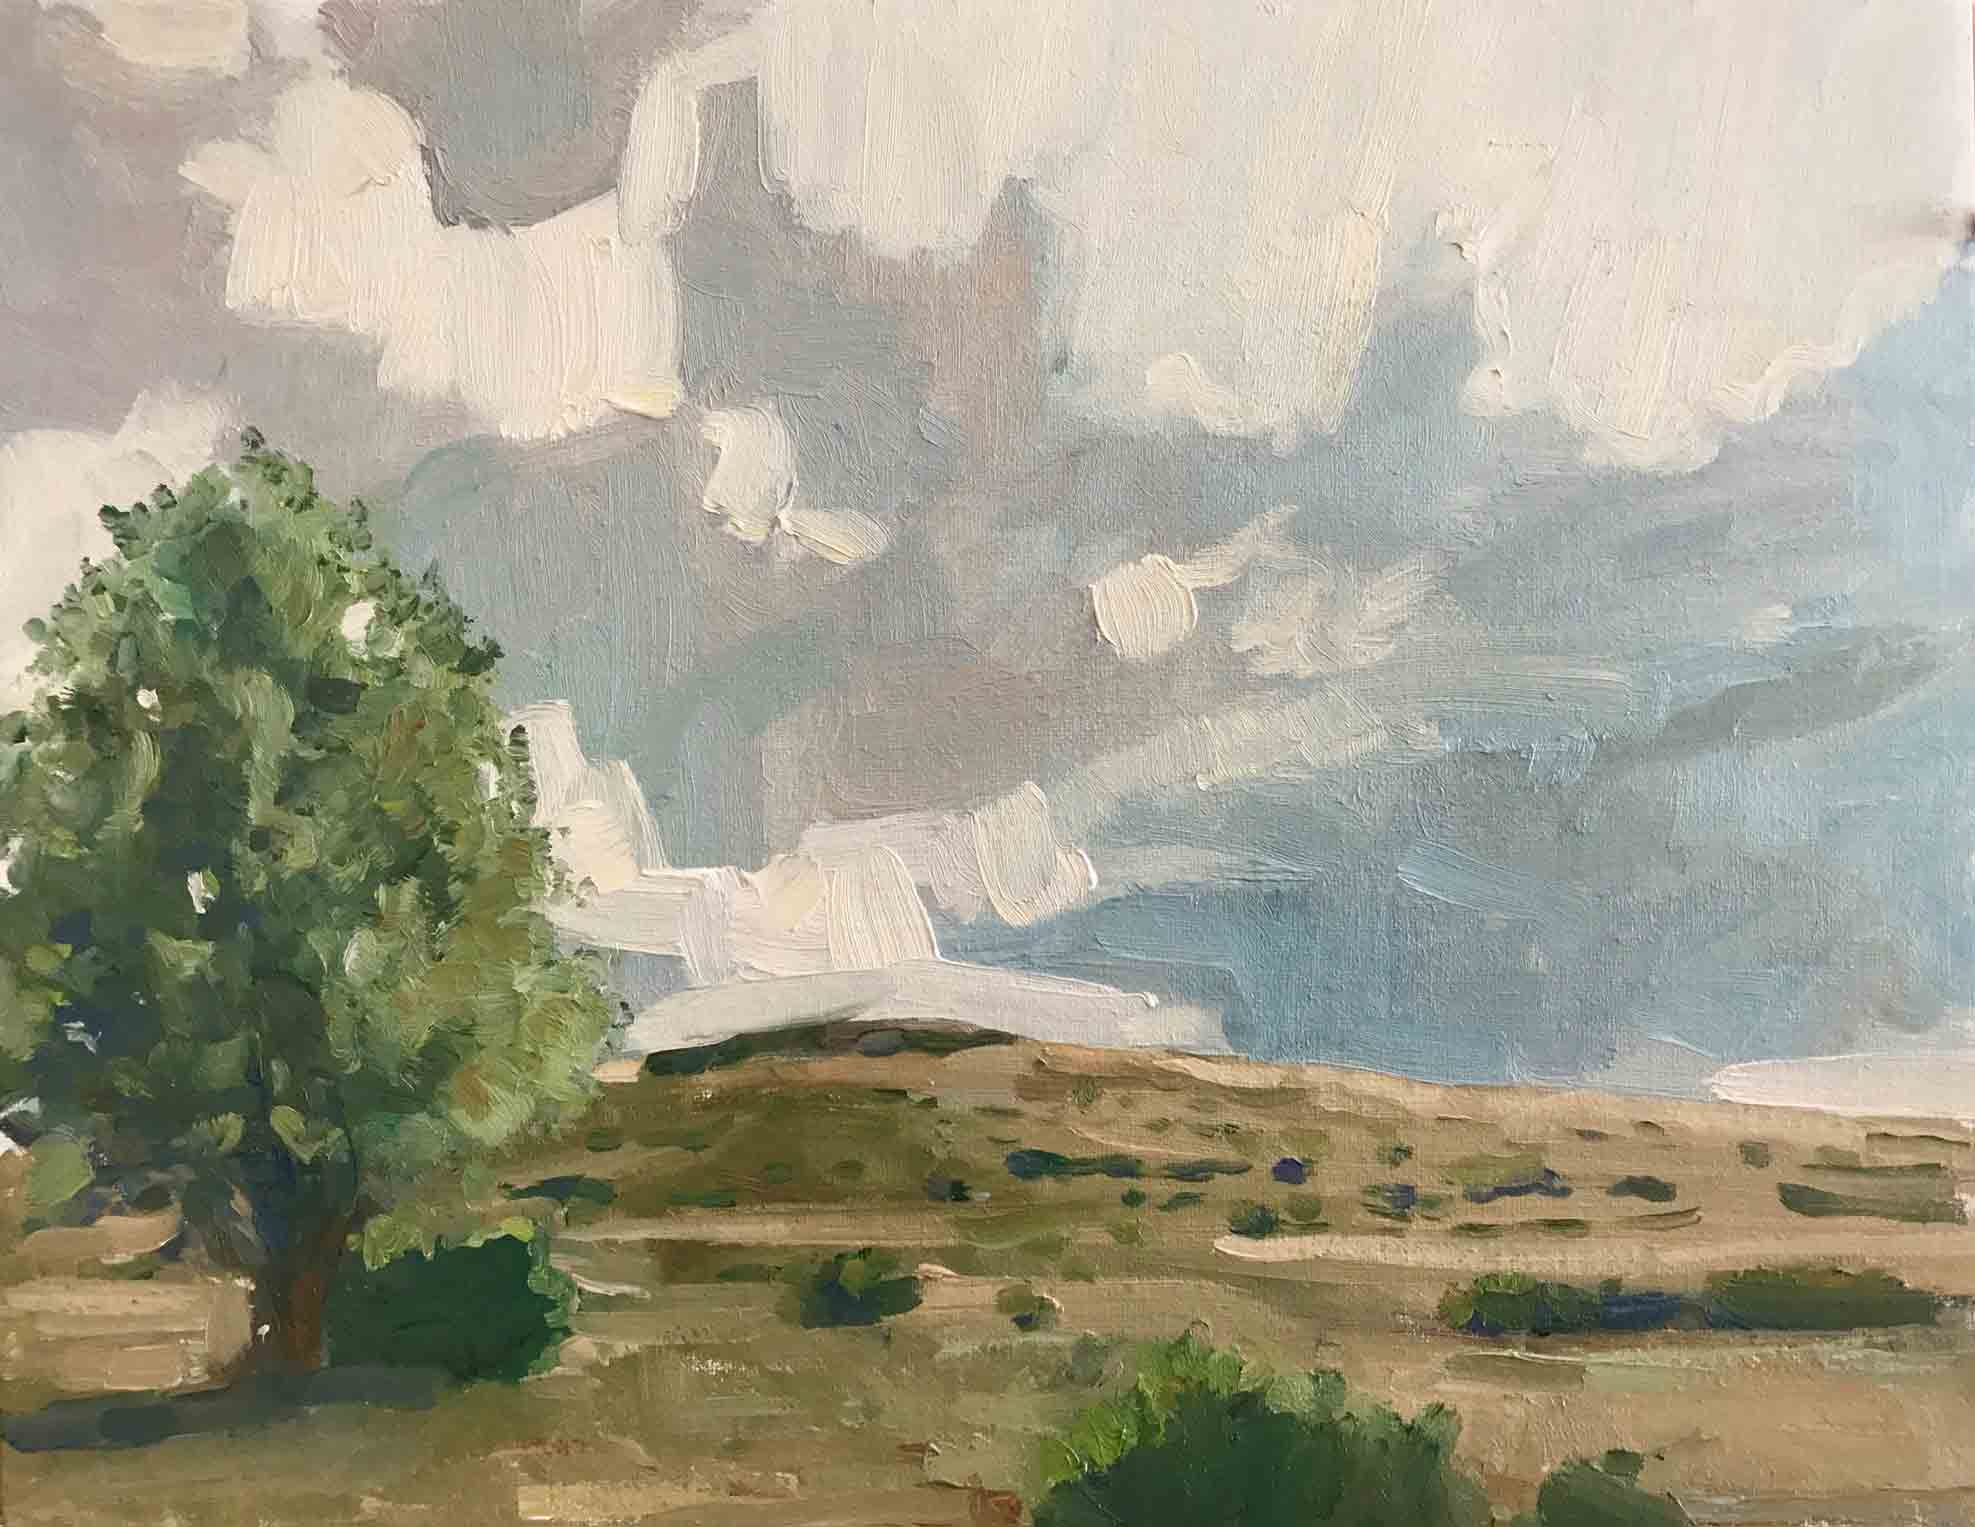 Desert-Landscape-en-plein-air-11x14_web.jpg